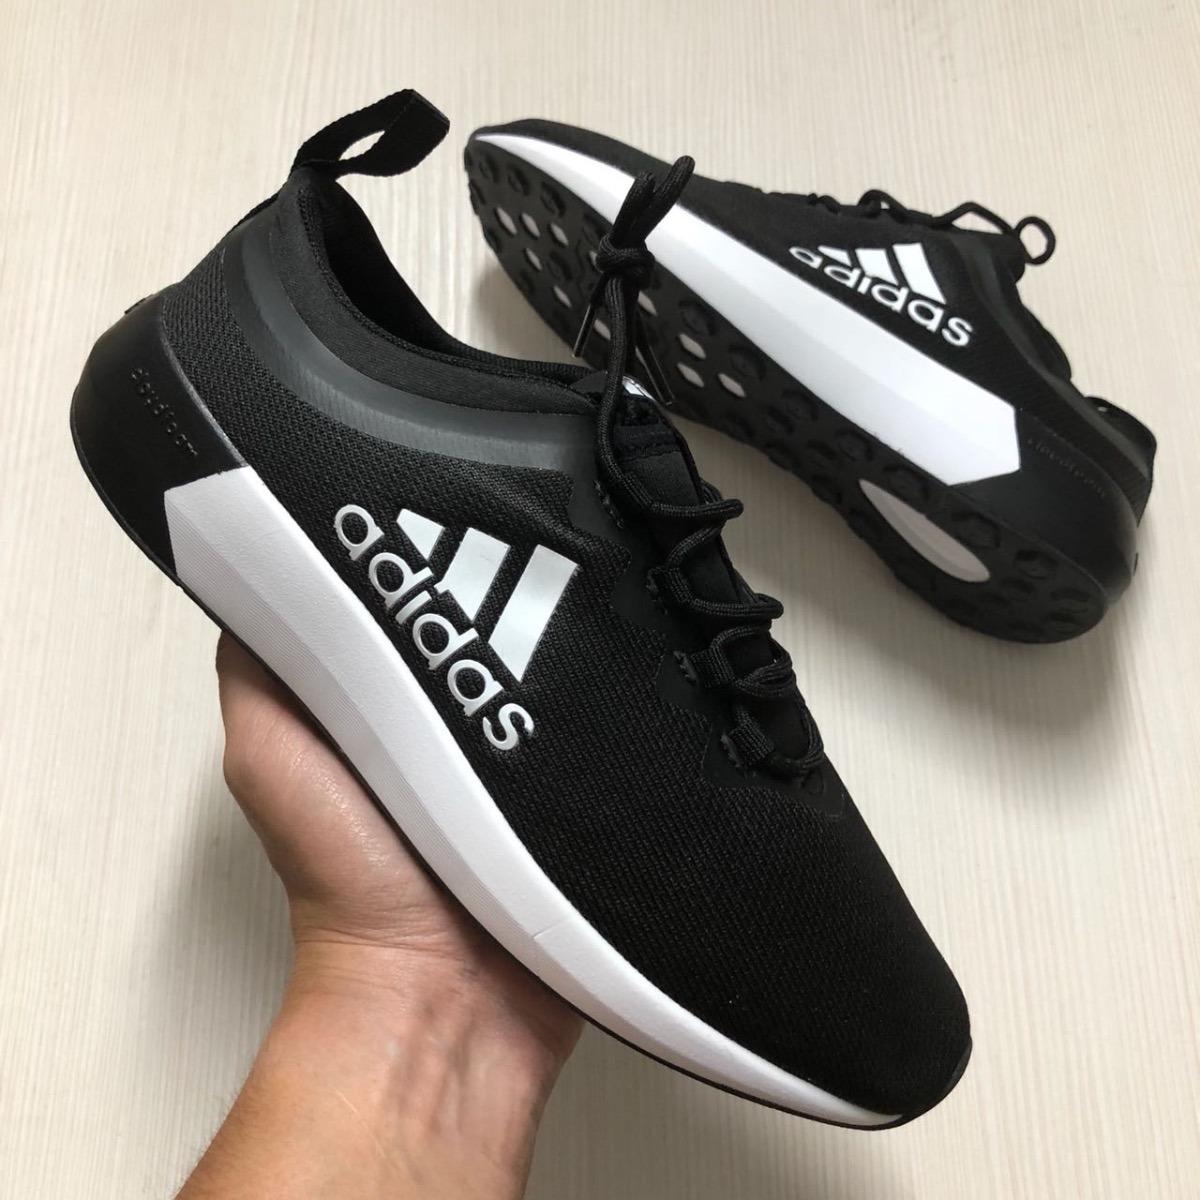 Tenis Zapatillas adidas X Negra Blanca Hombre Env Gr -   144.900 en ... 56f0630e85ce9